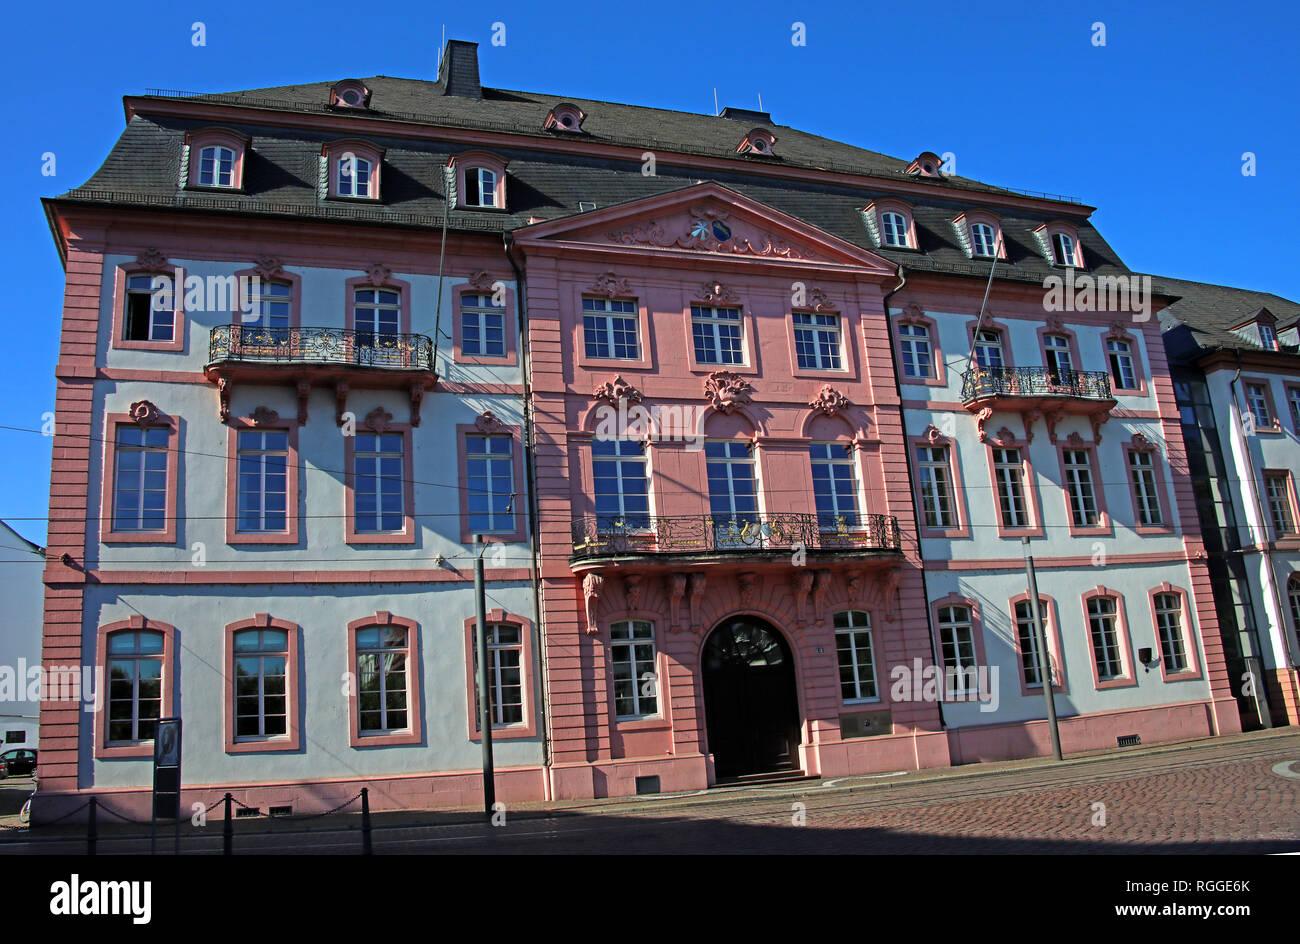 GoTonySmith,@HotpixUK,HotpixUK,Germany,German,Mainz,Rhine,City